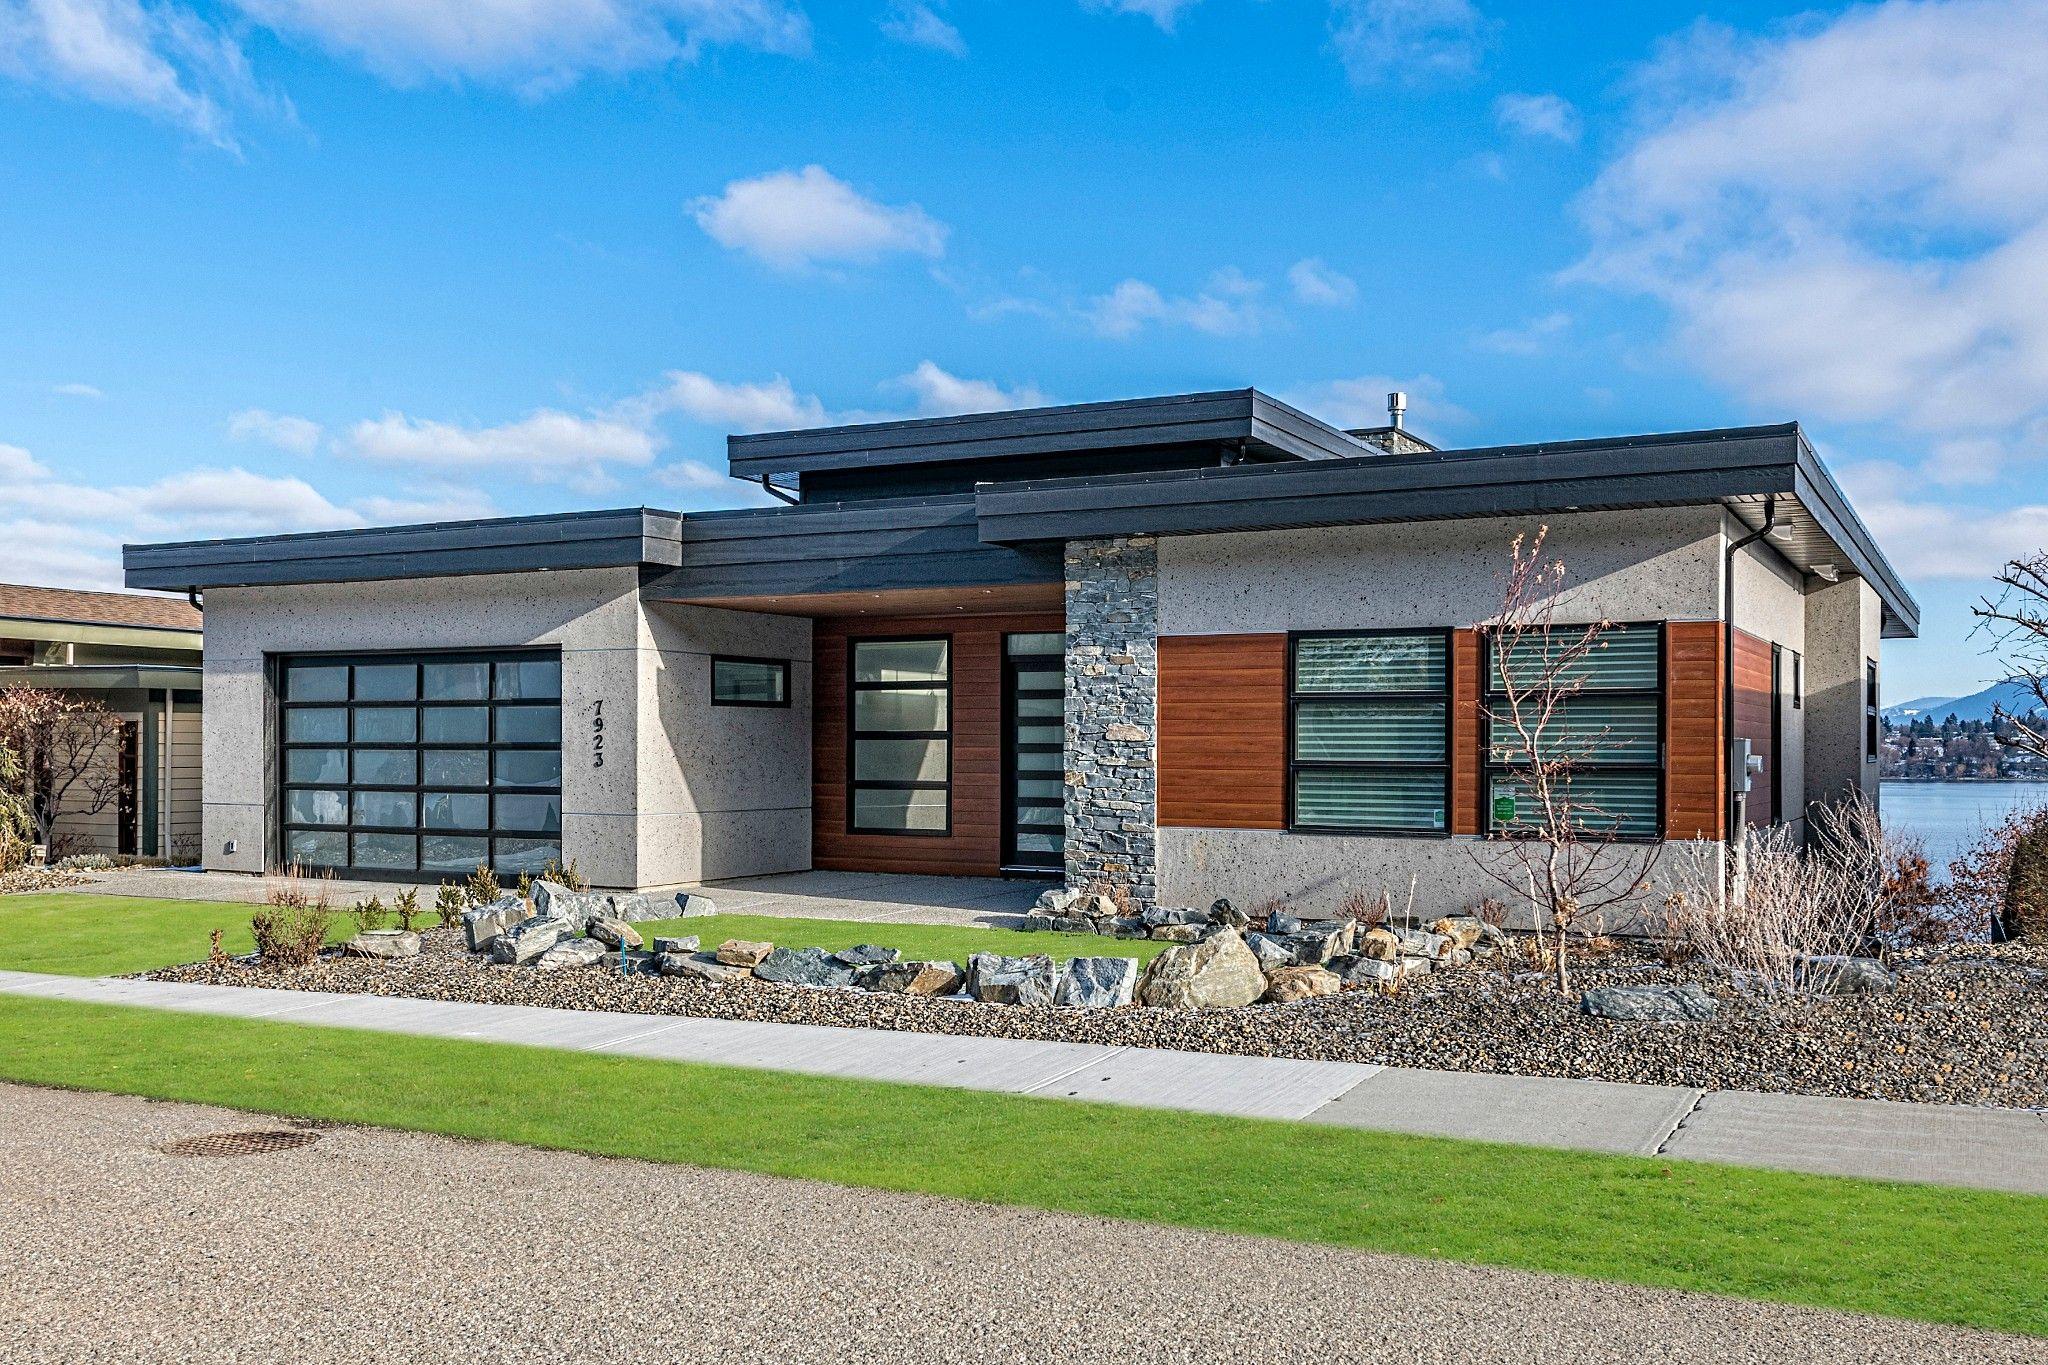 Main Photo: 7923 Graystone Drive in Coldstream: Mun of Coldstream House for sale (North Okanagan)  : MLS®# 10221887